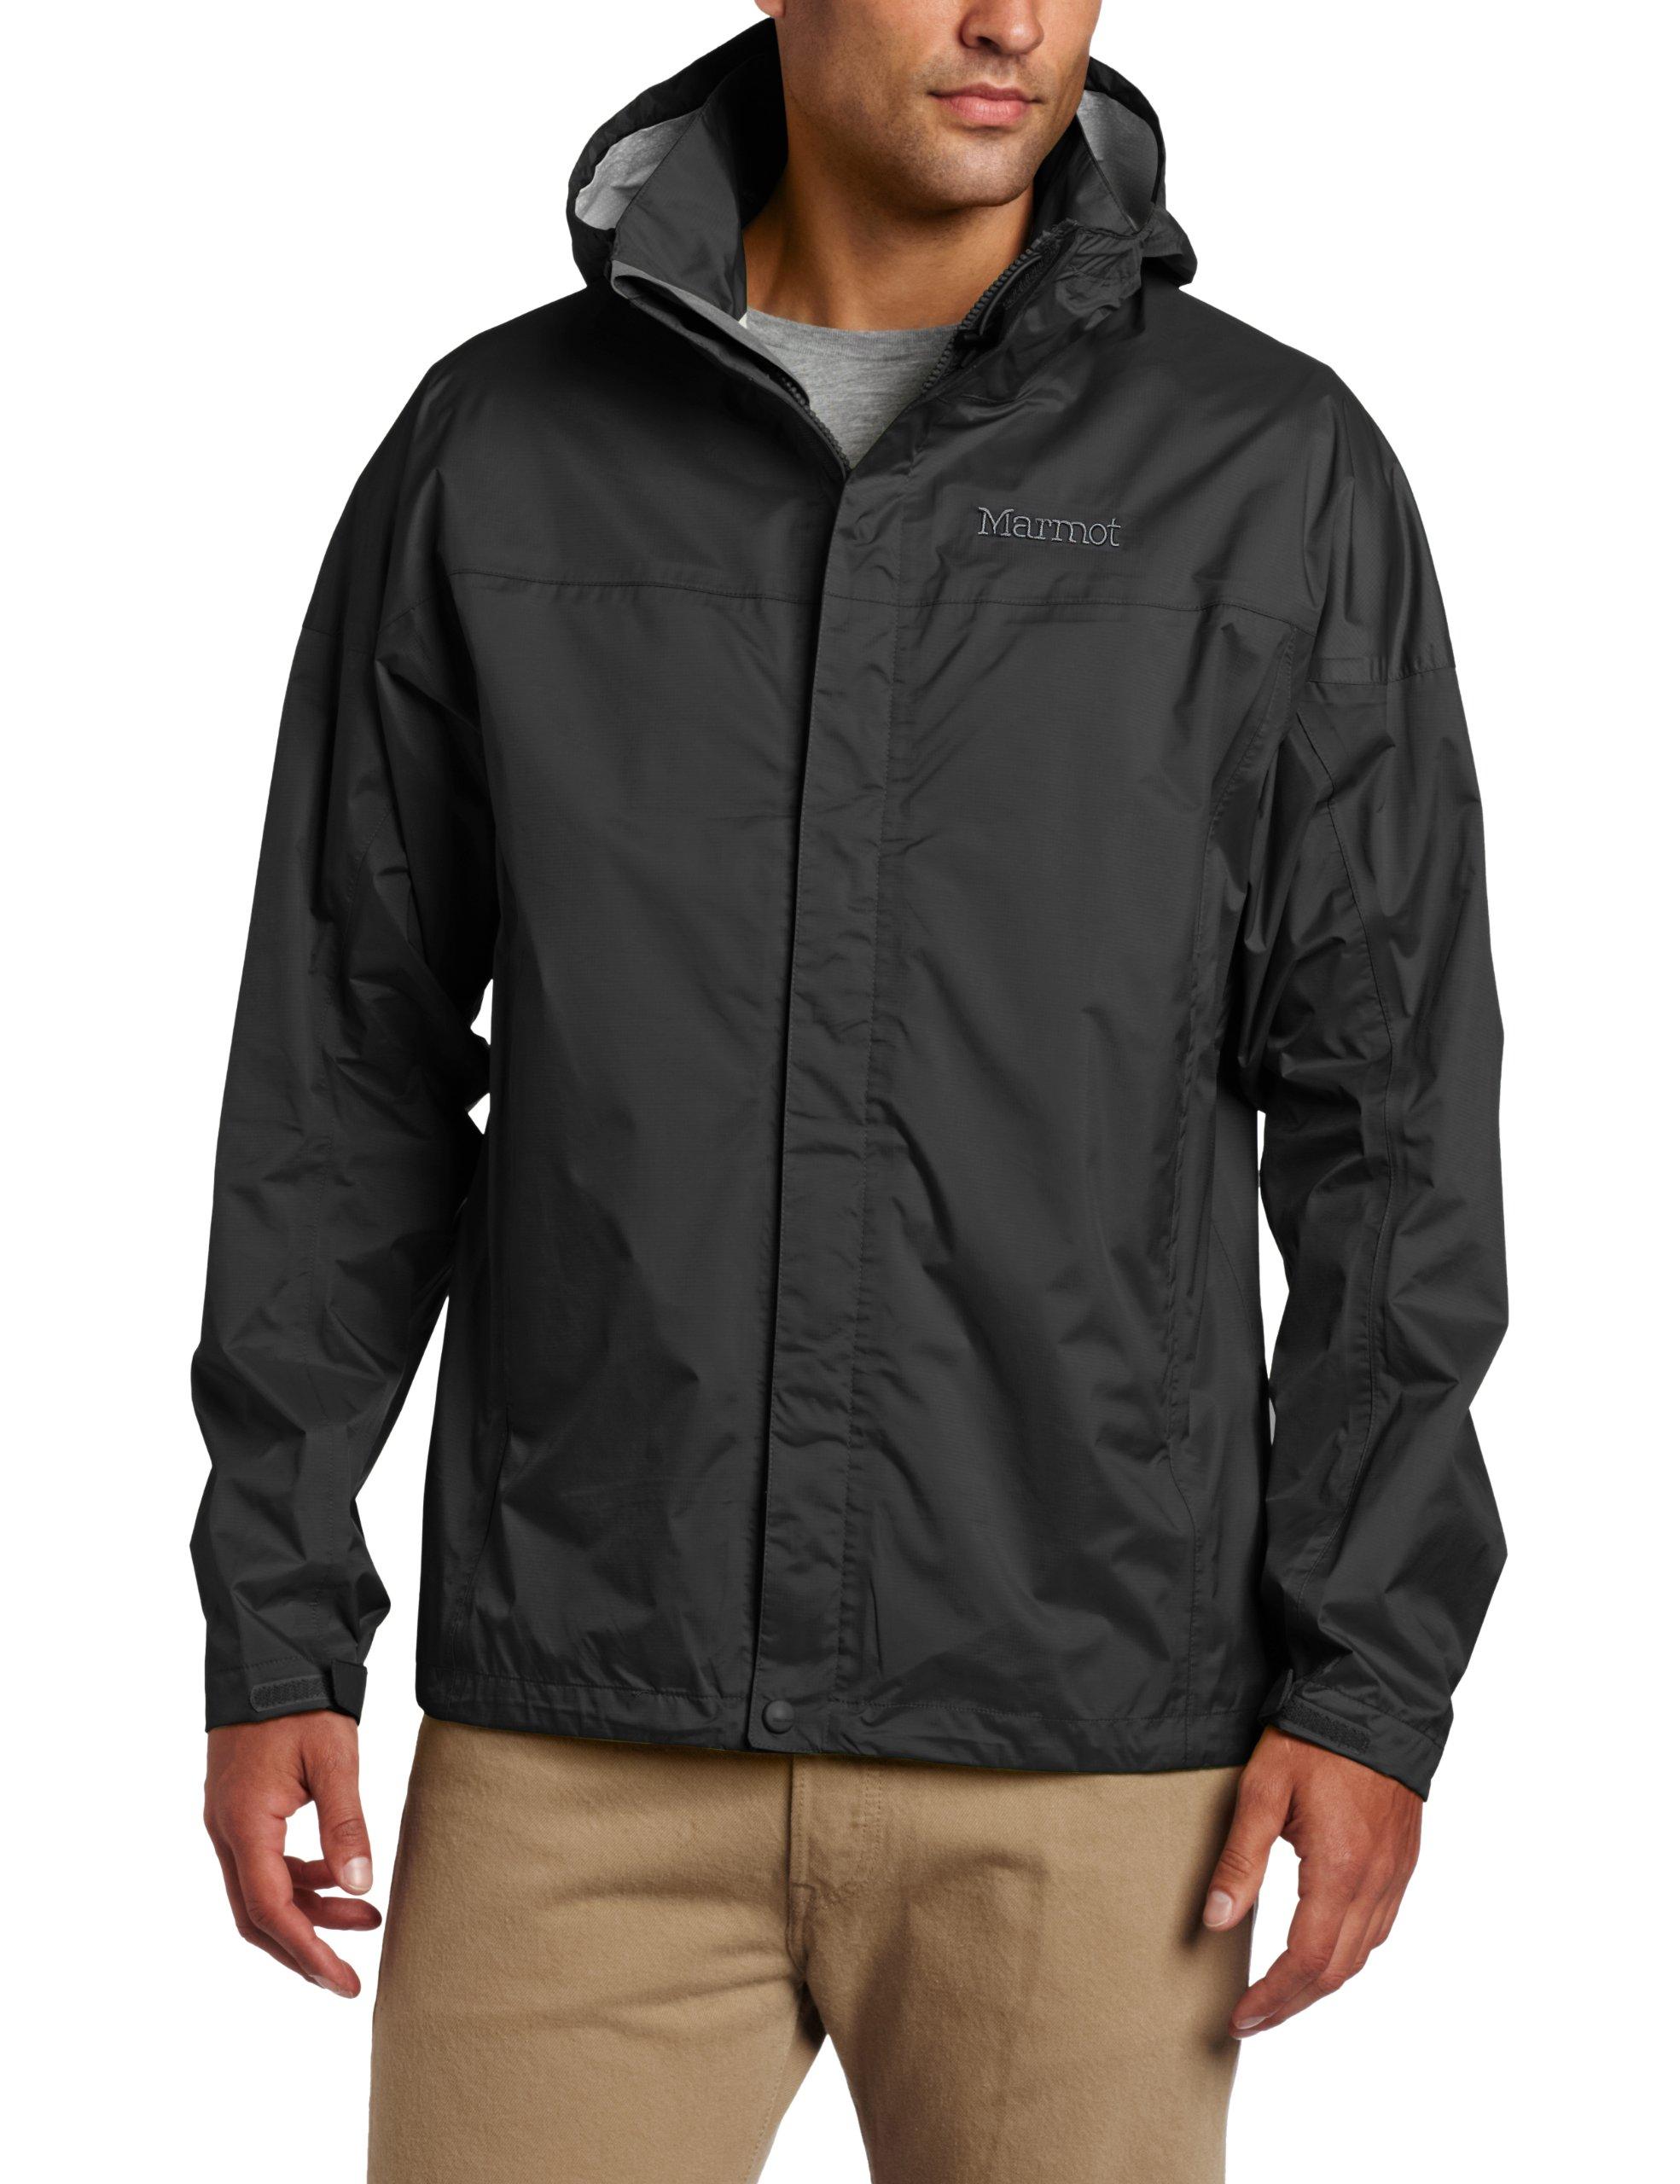 Marmot Men's Precip Jacket, Slate Grey, Medium